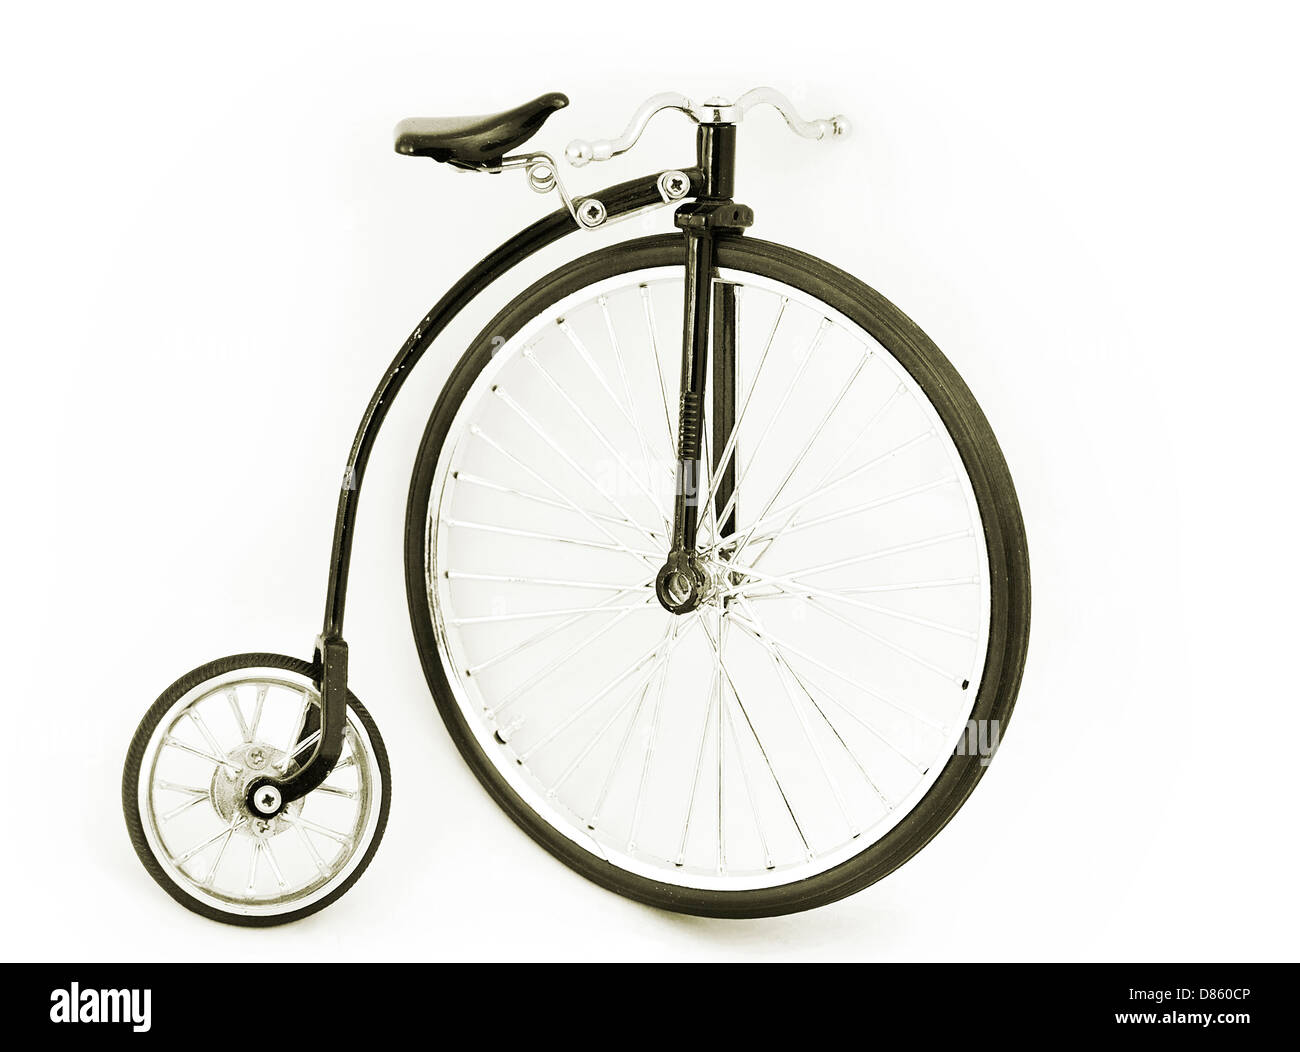 vintage circus bicycle - Stock Image